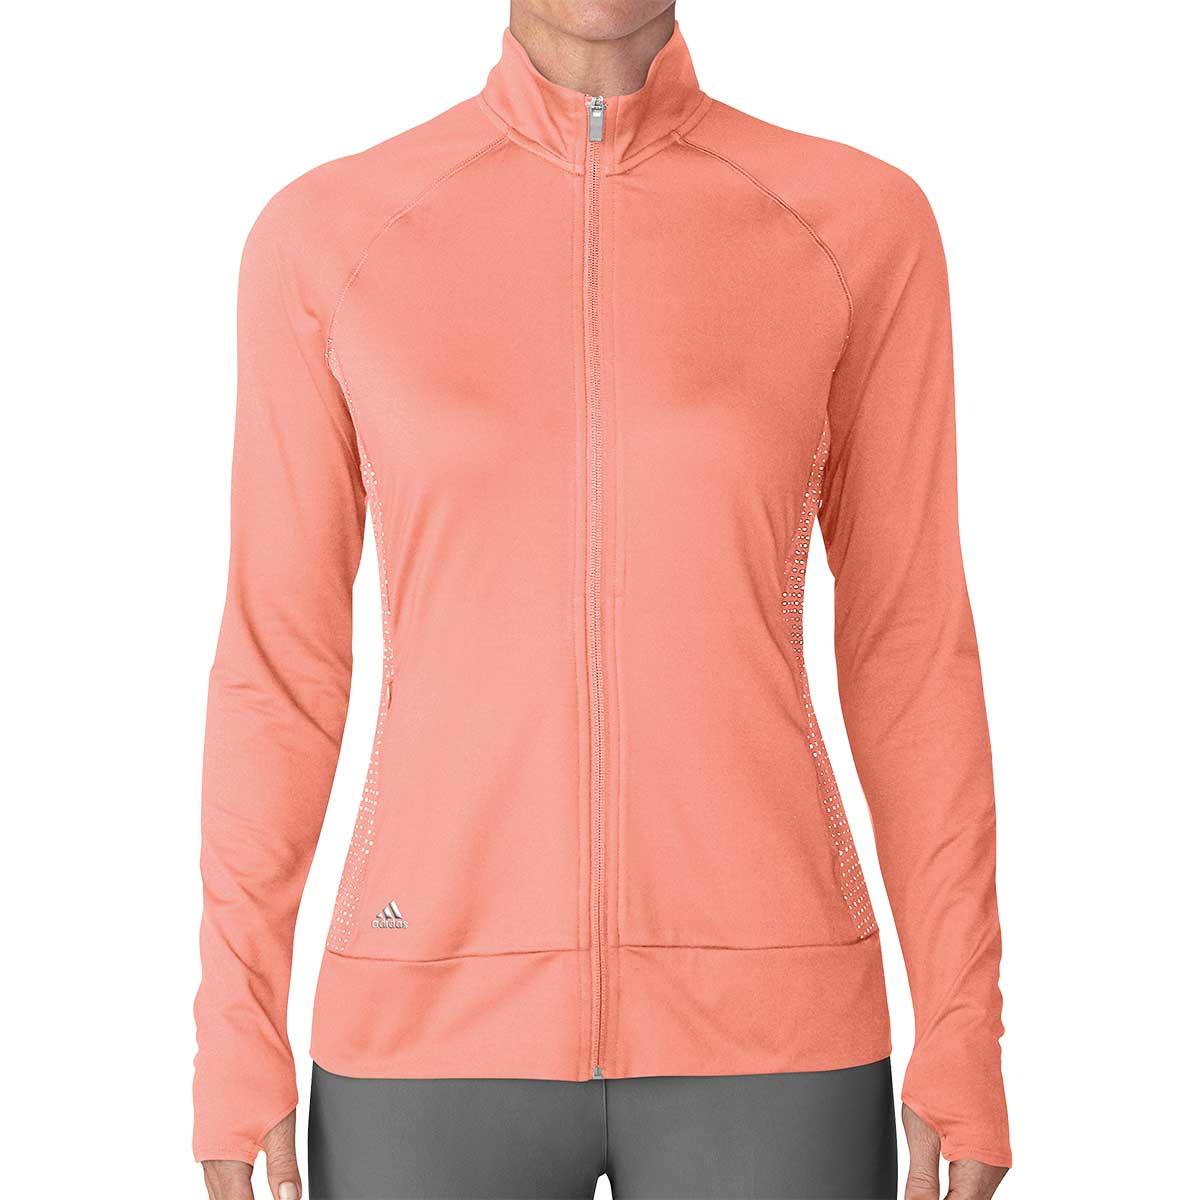 Adidas Women's Rangewear Full Zip Jacket - Coral